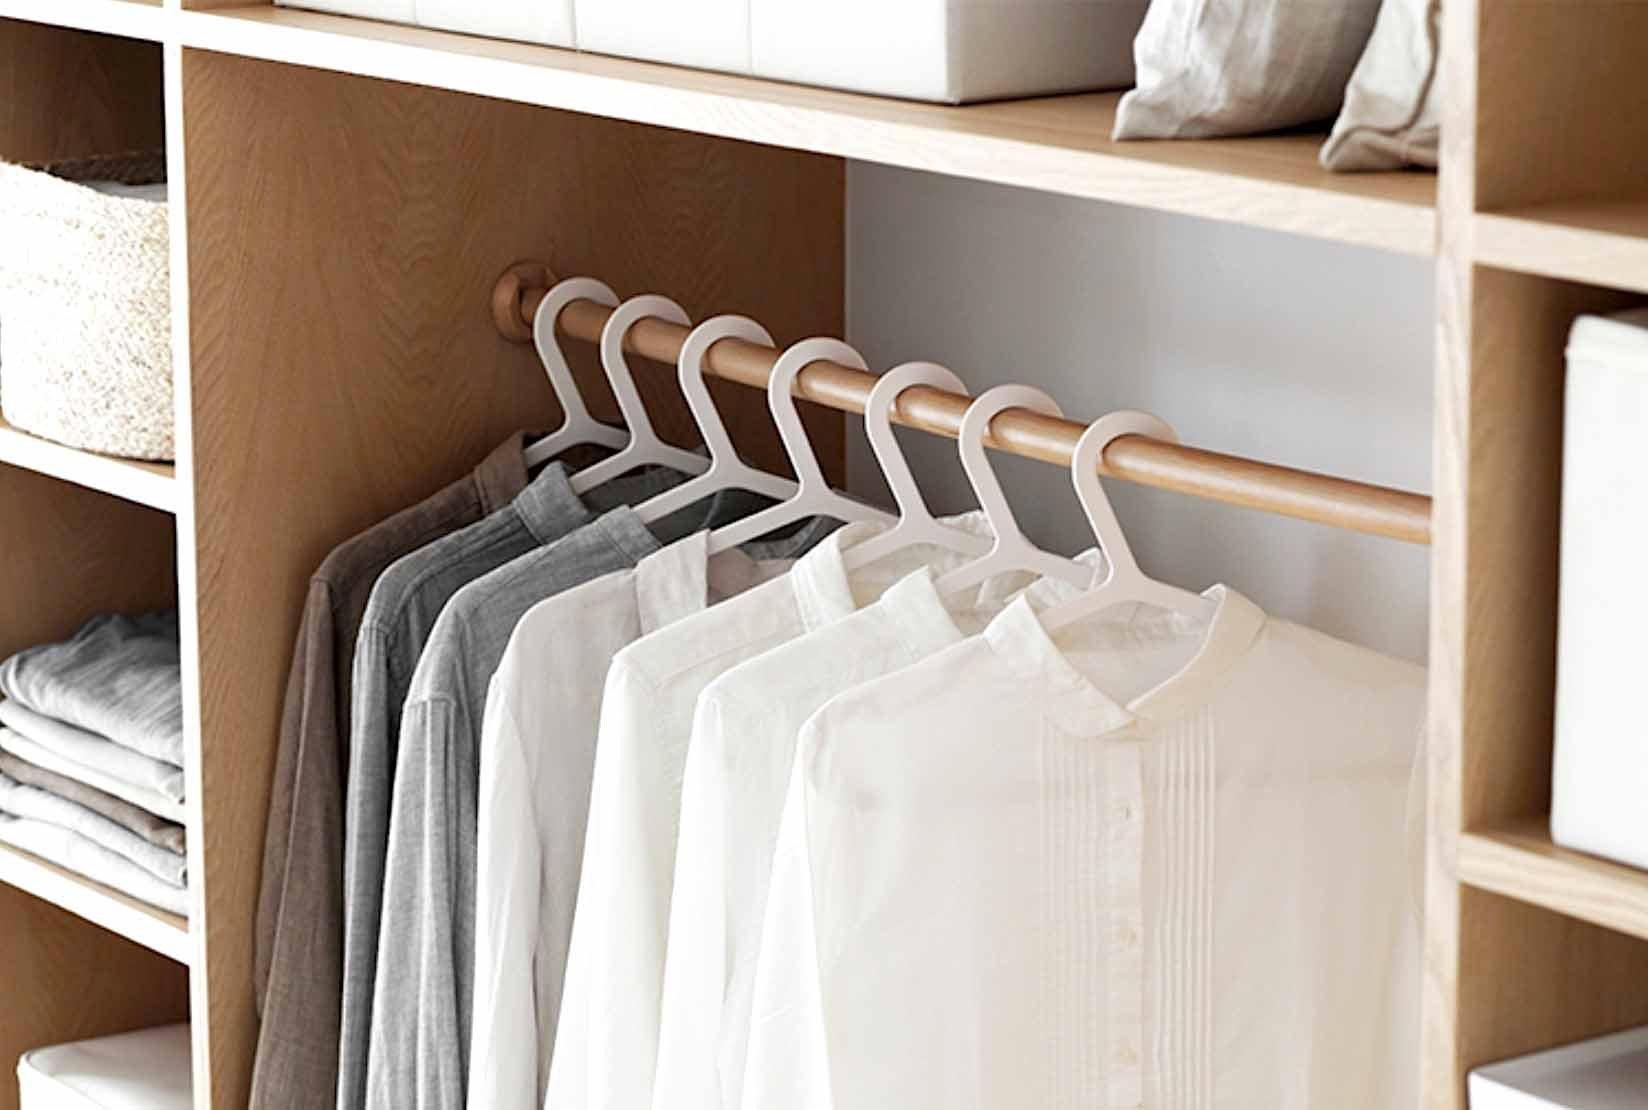 closet wardrobe organisation organization ideas designs walk in closet wardrobe organizer organiser